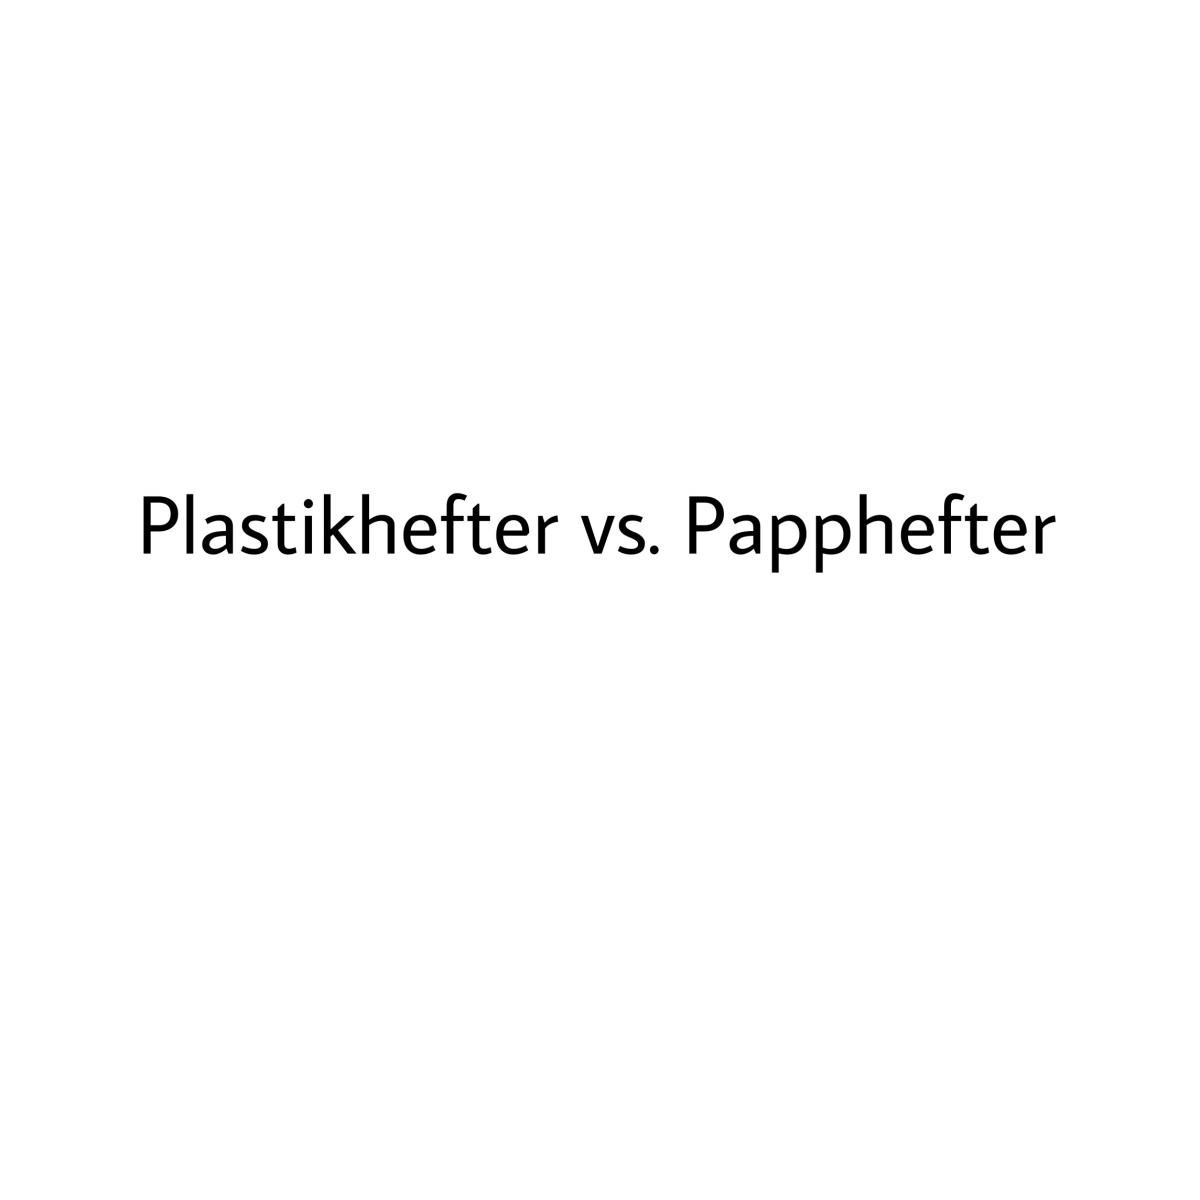 Plastikhefter vs. Papphefter